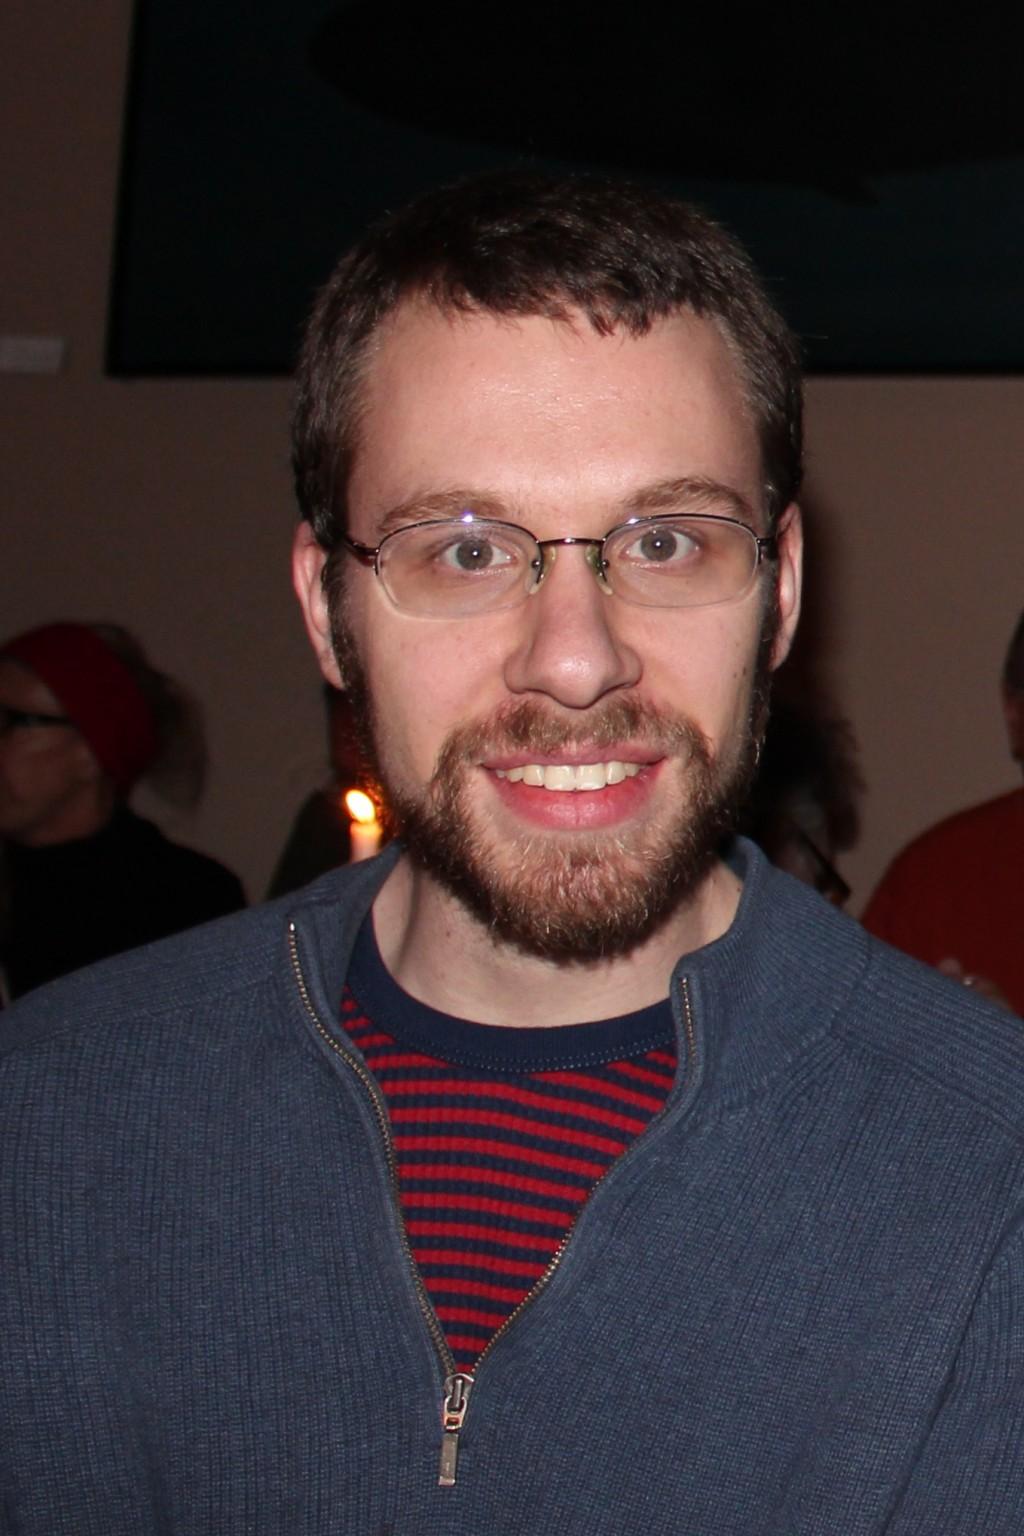 Jon Klapel